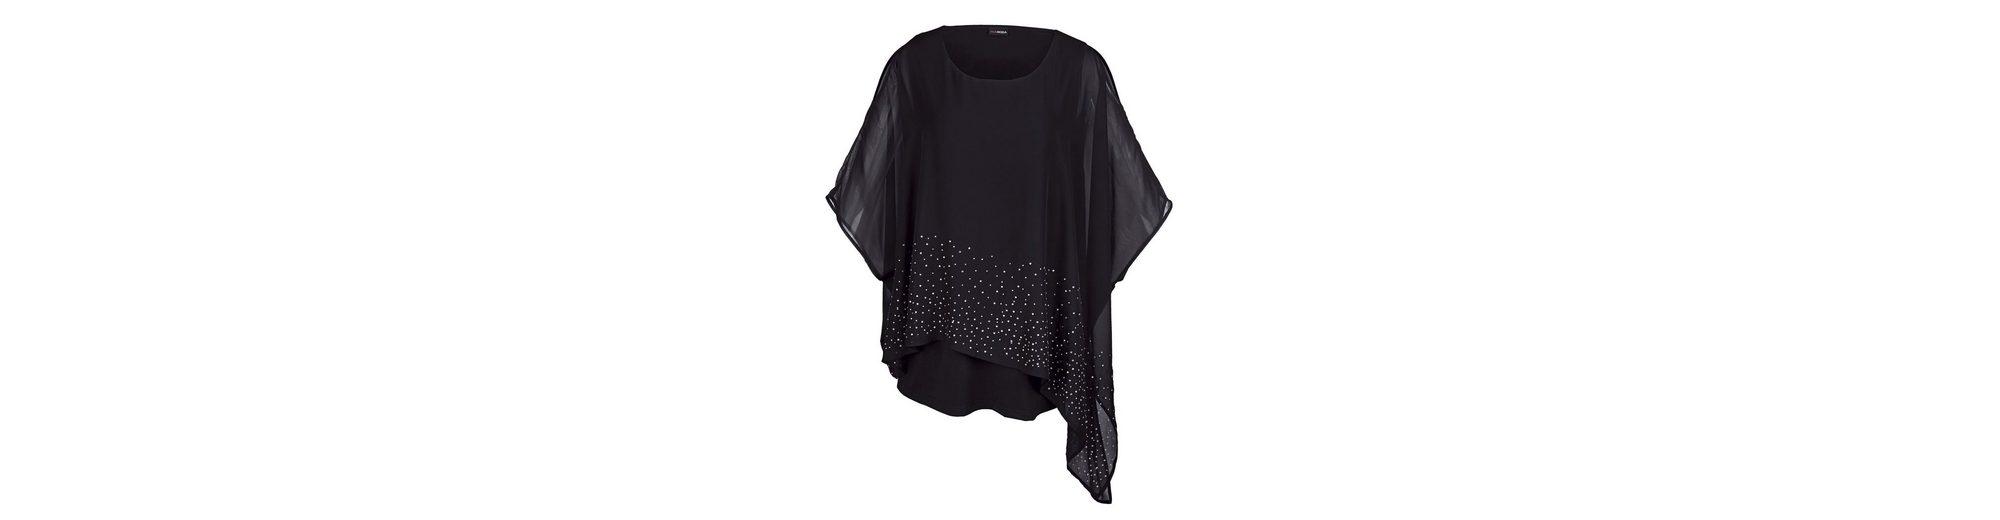 2 in MIAMODA in Shirt MIAMODA Shirt Optik in 1 nWzvq4WX